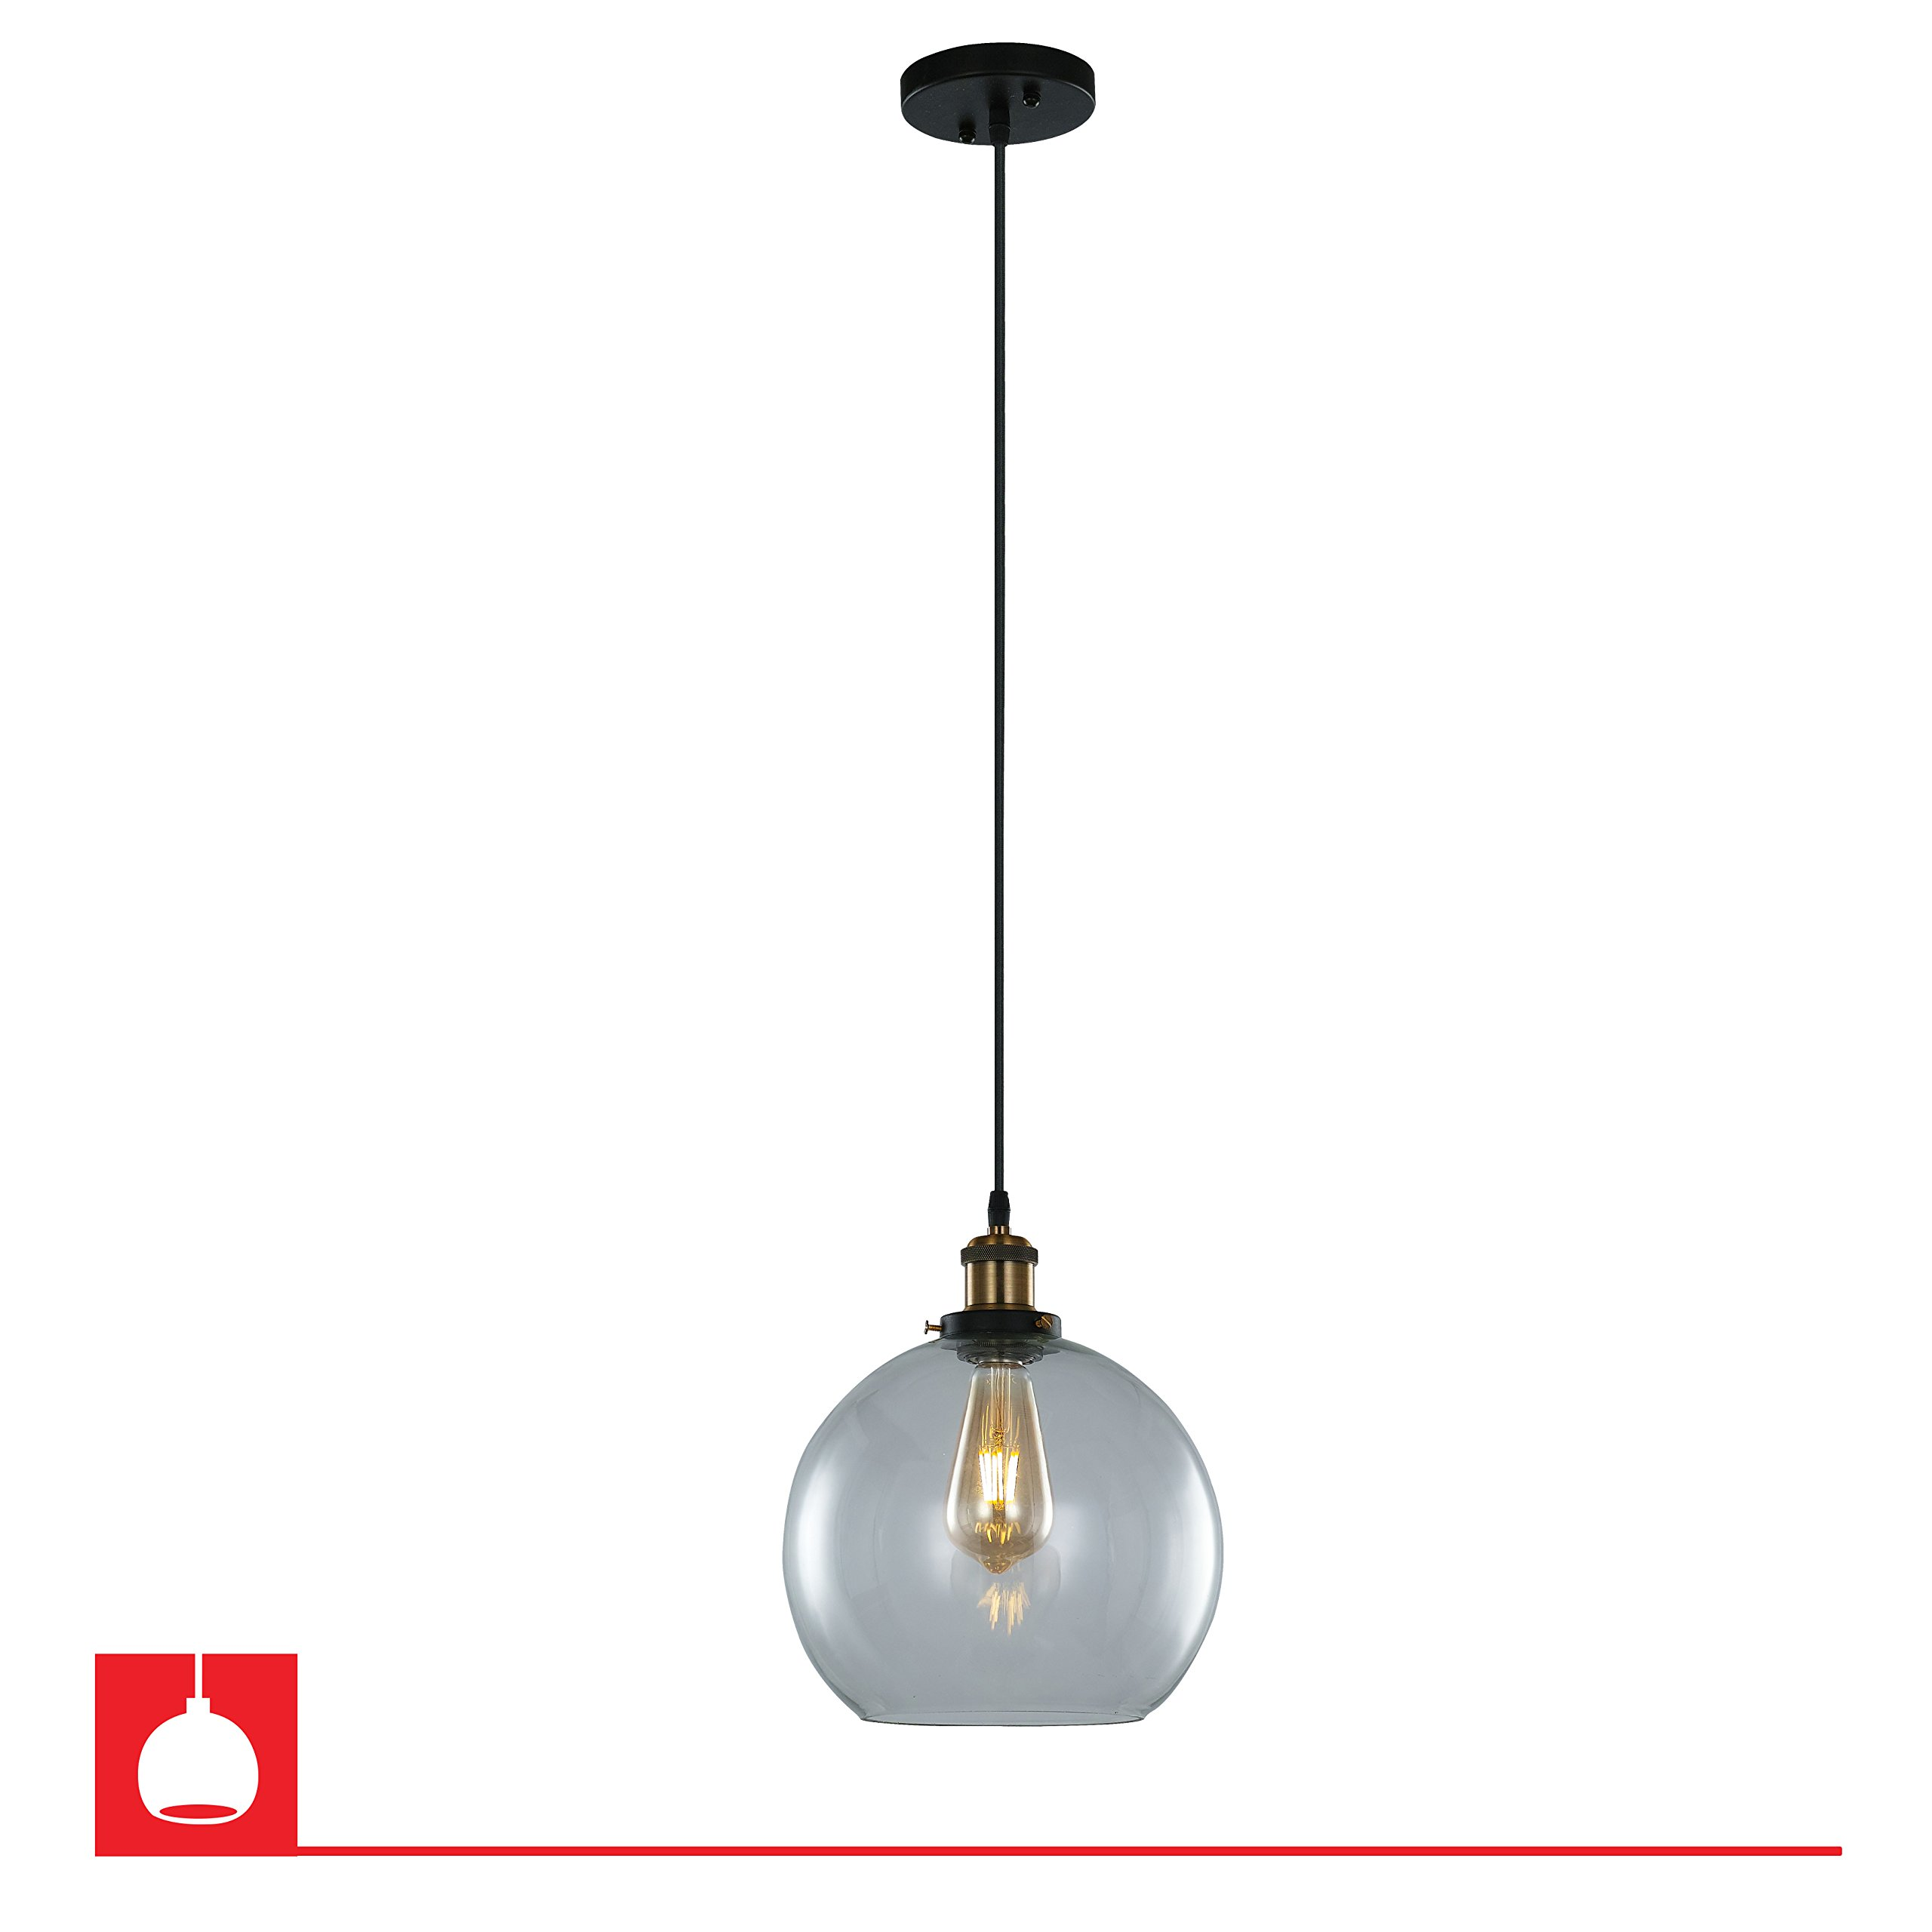 Winfield Circular Single Bulb Encased Pendant Fixture – Brown Bronze, 25 X 28CM Shade